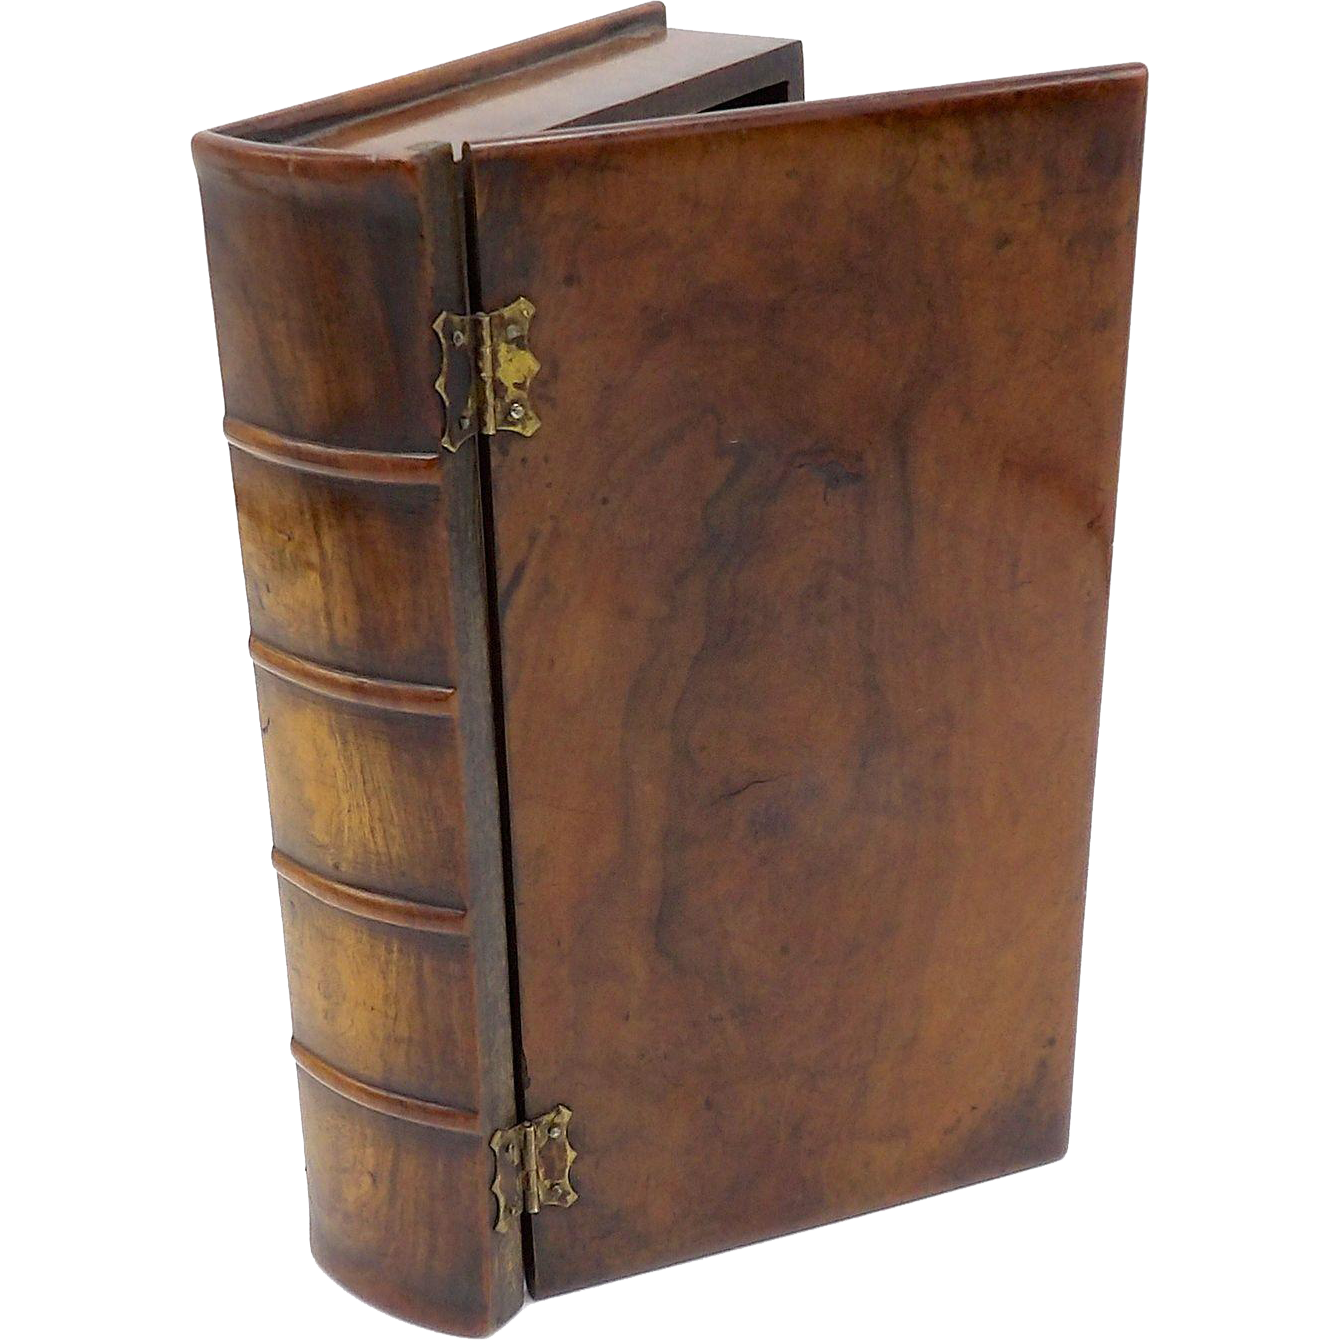 19th Century Handmade Hard Wood Book Shaped Box from ...